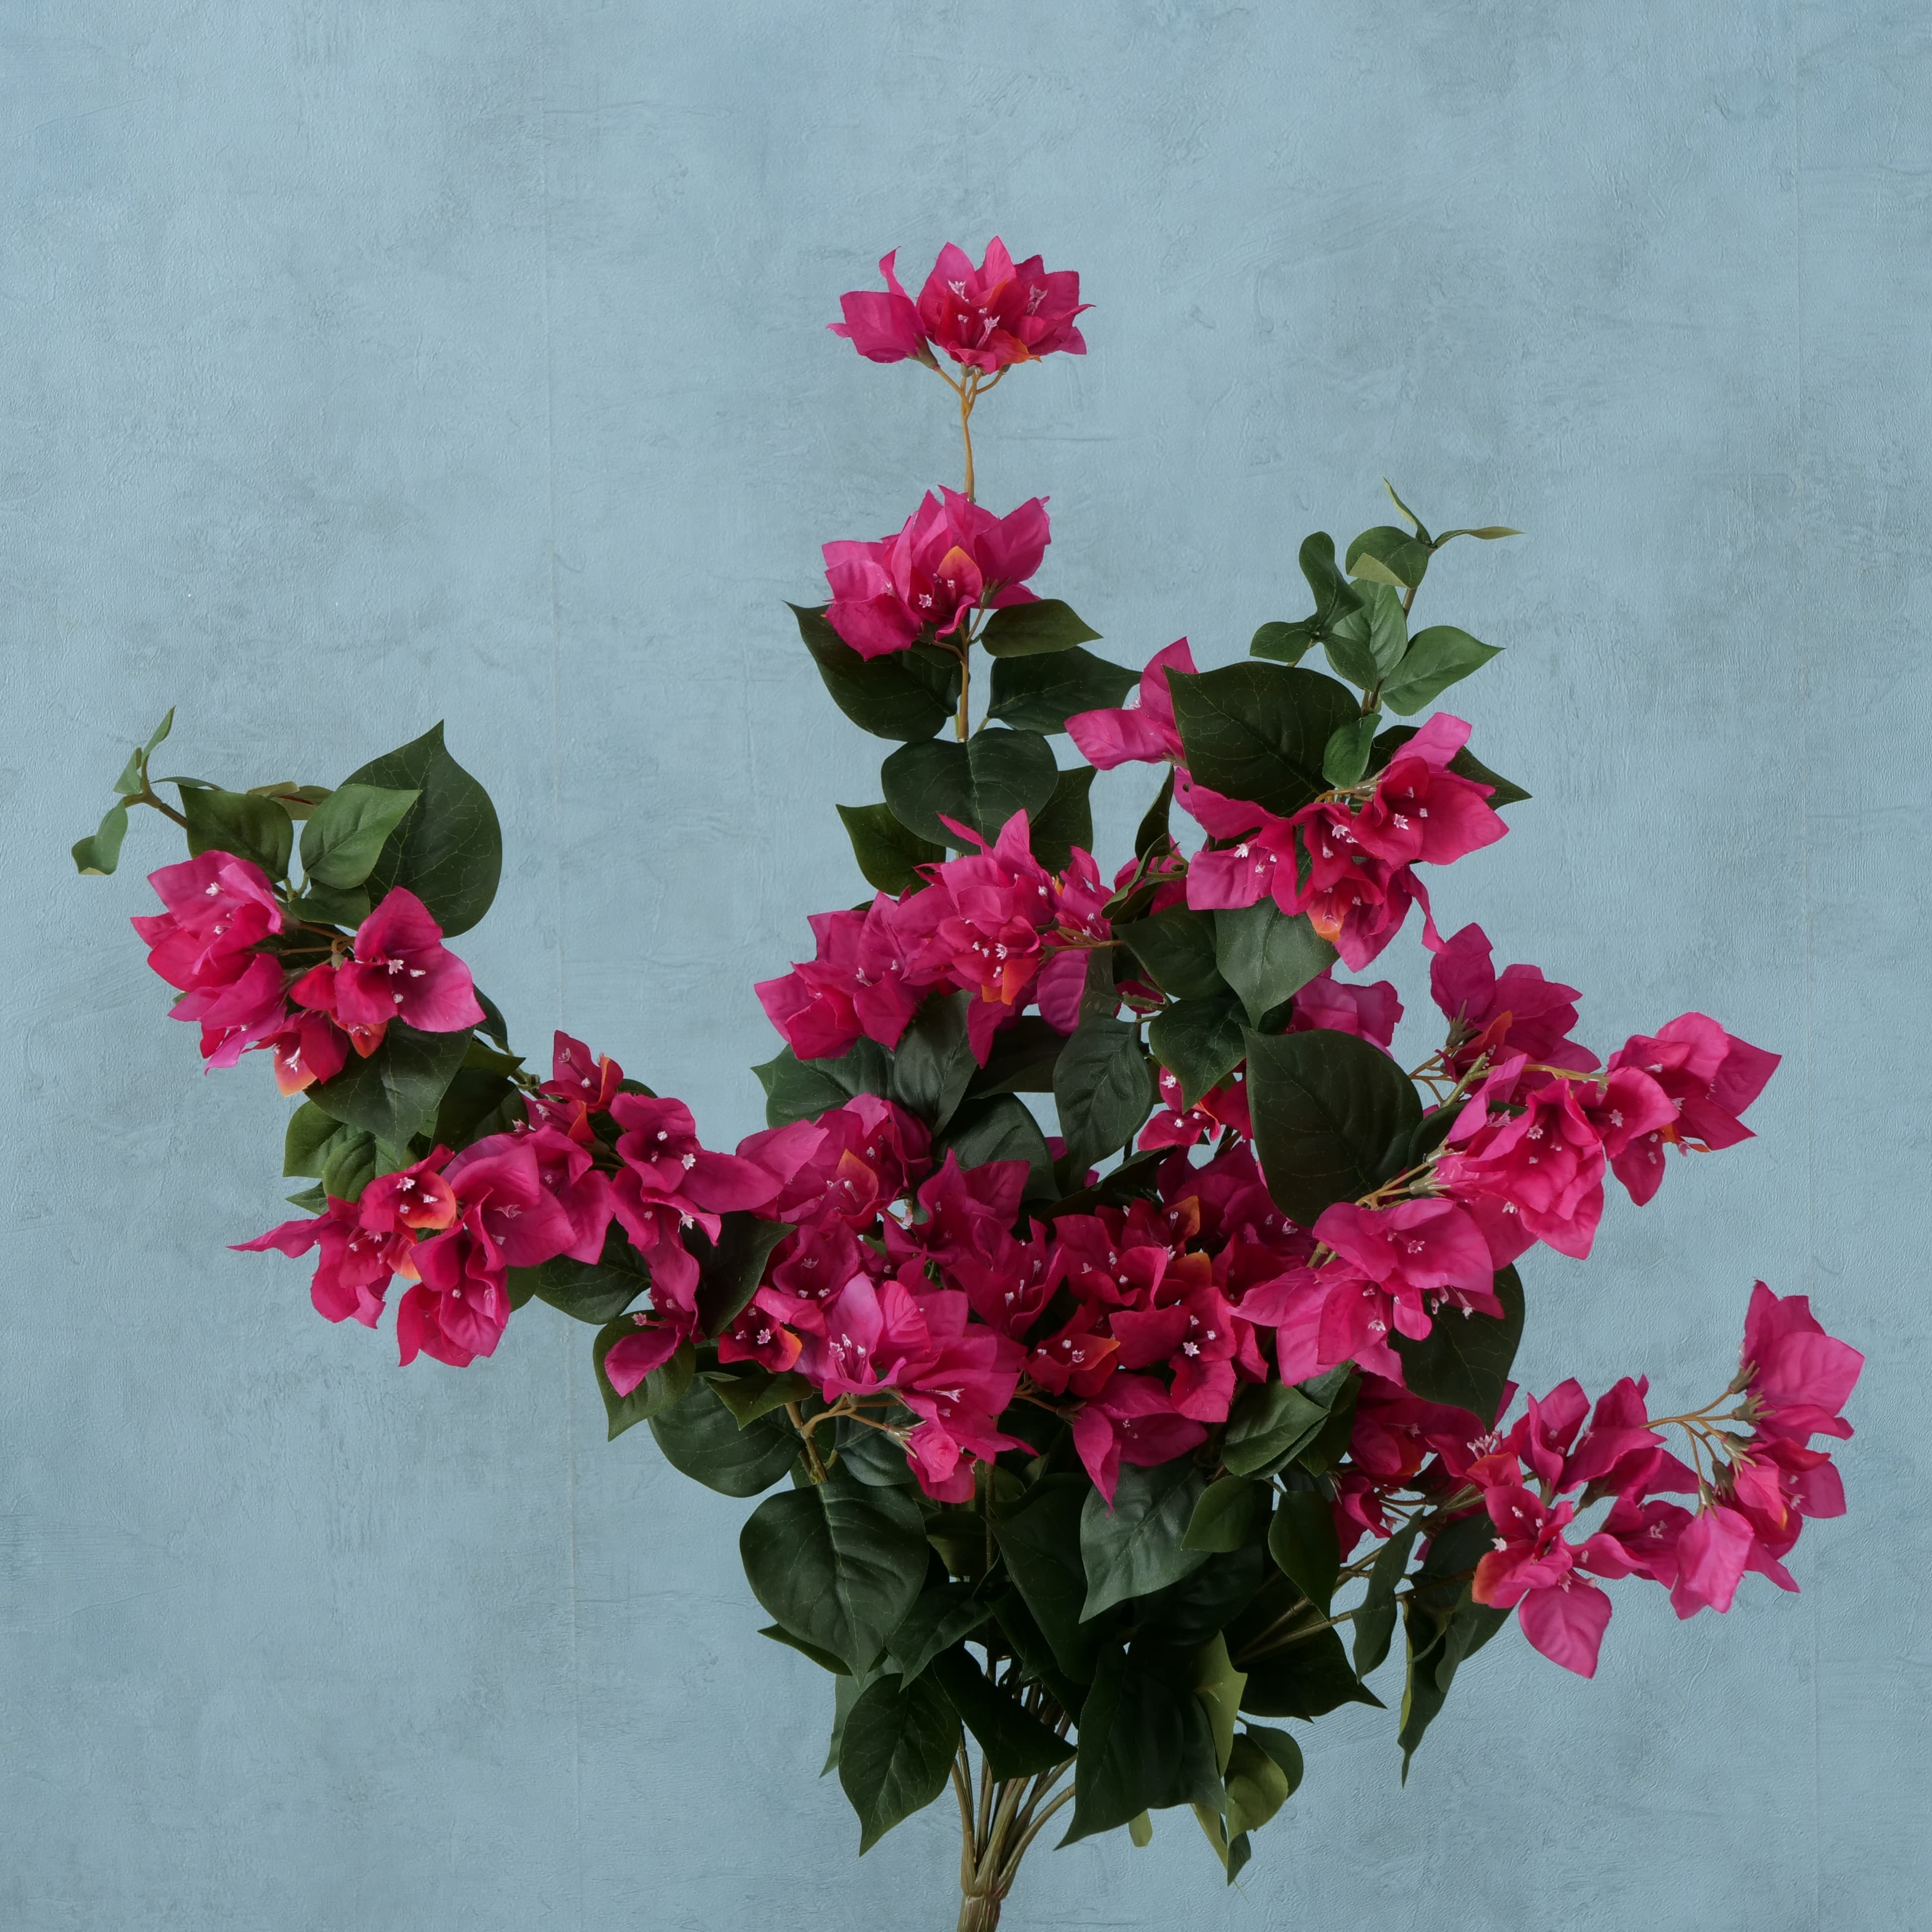 Buchet flori artificiale Bougainvillea Fucsia / Verde, H70 cm imagine